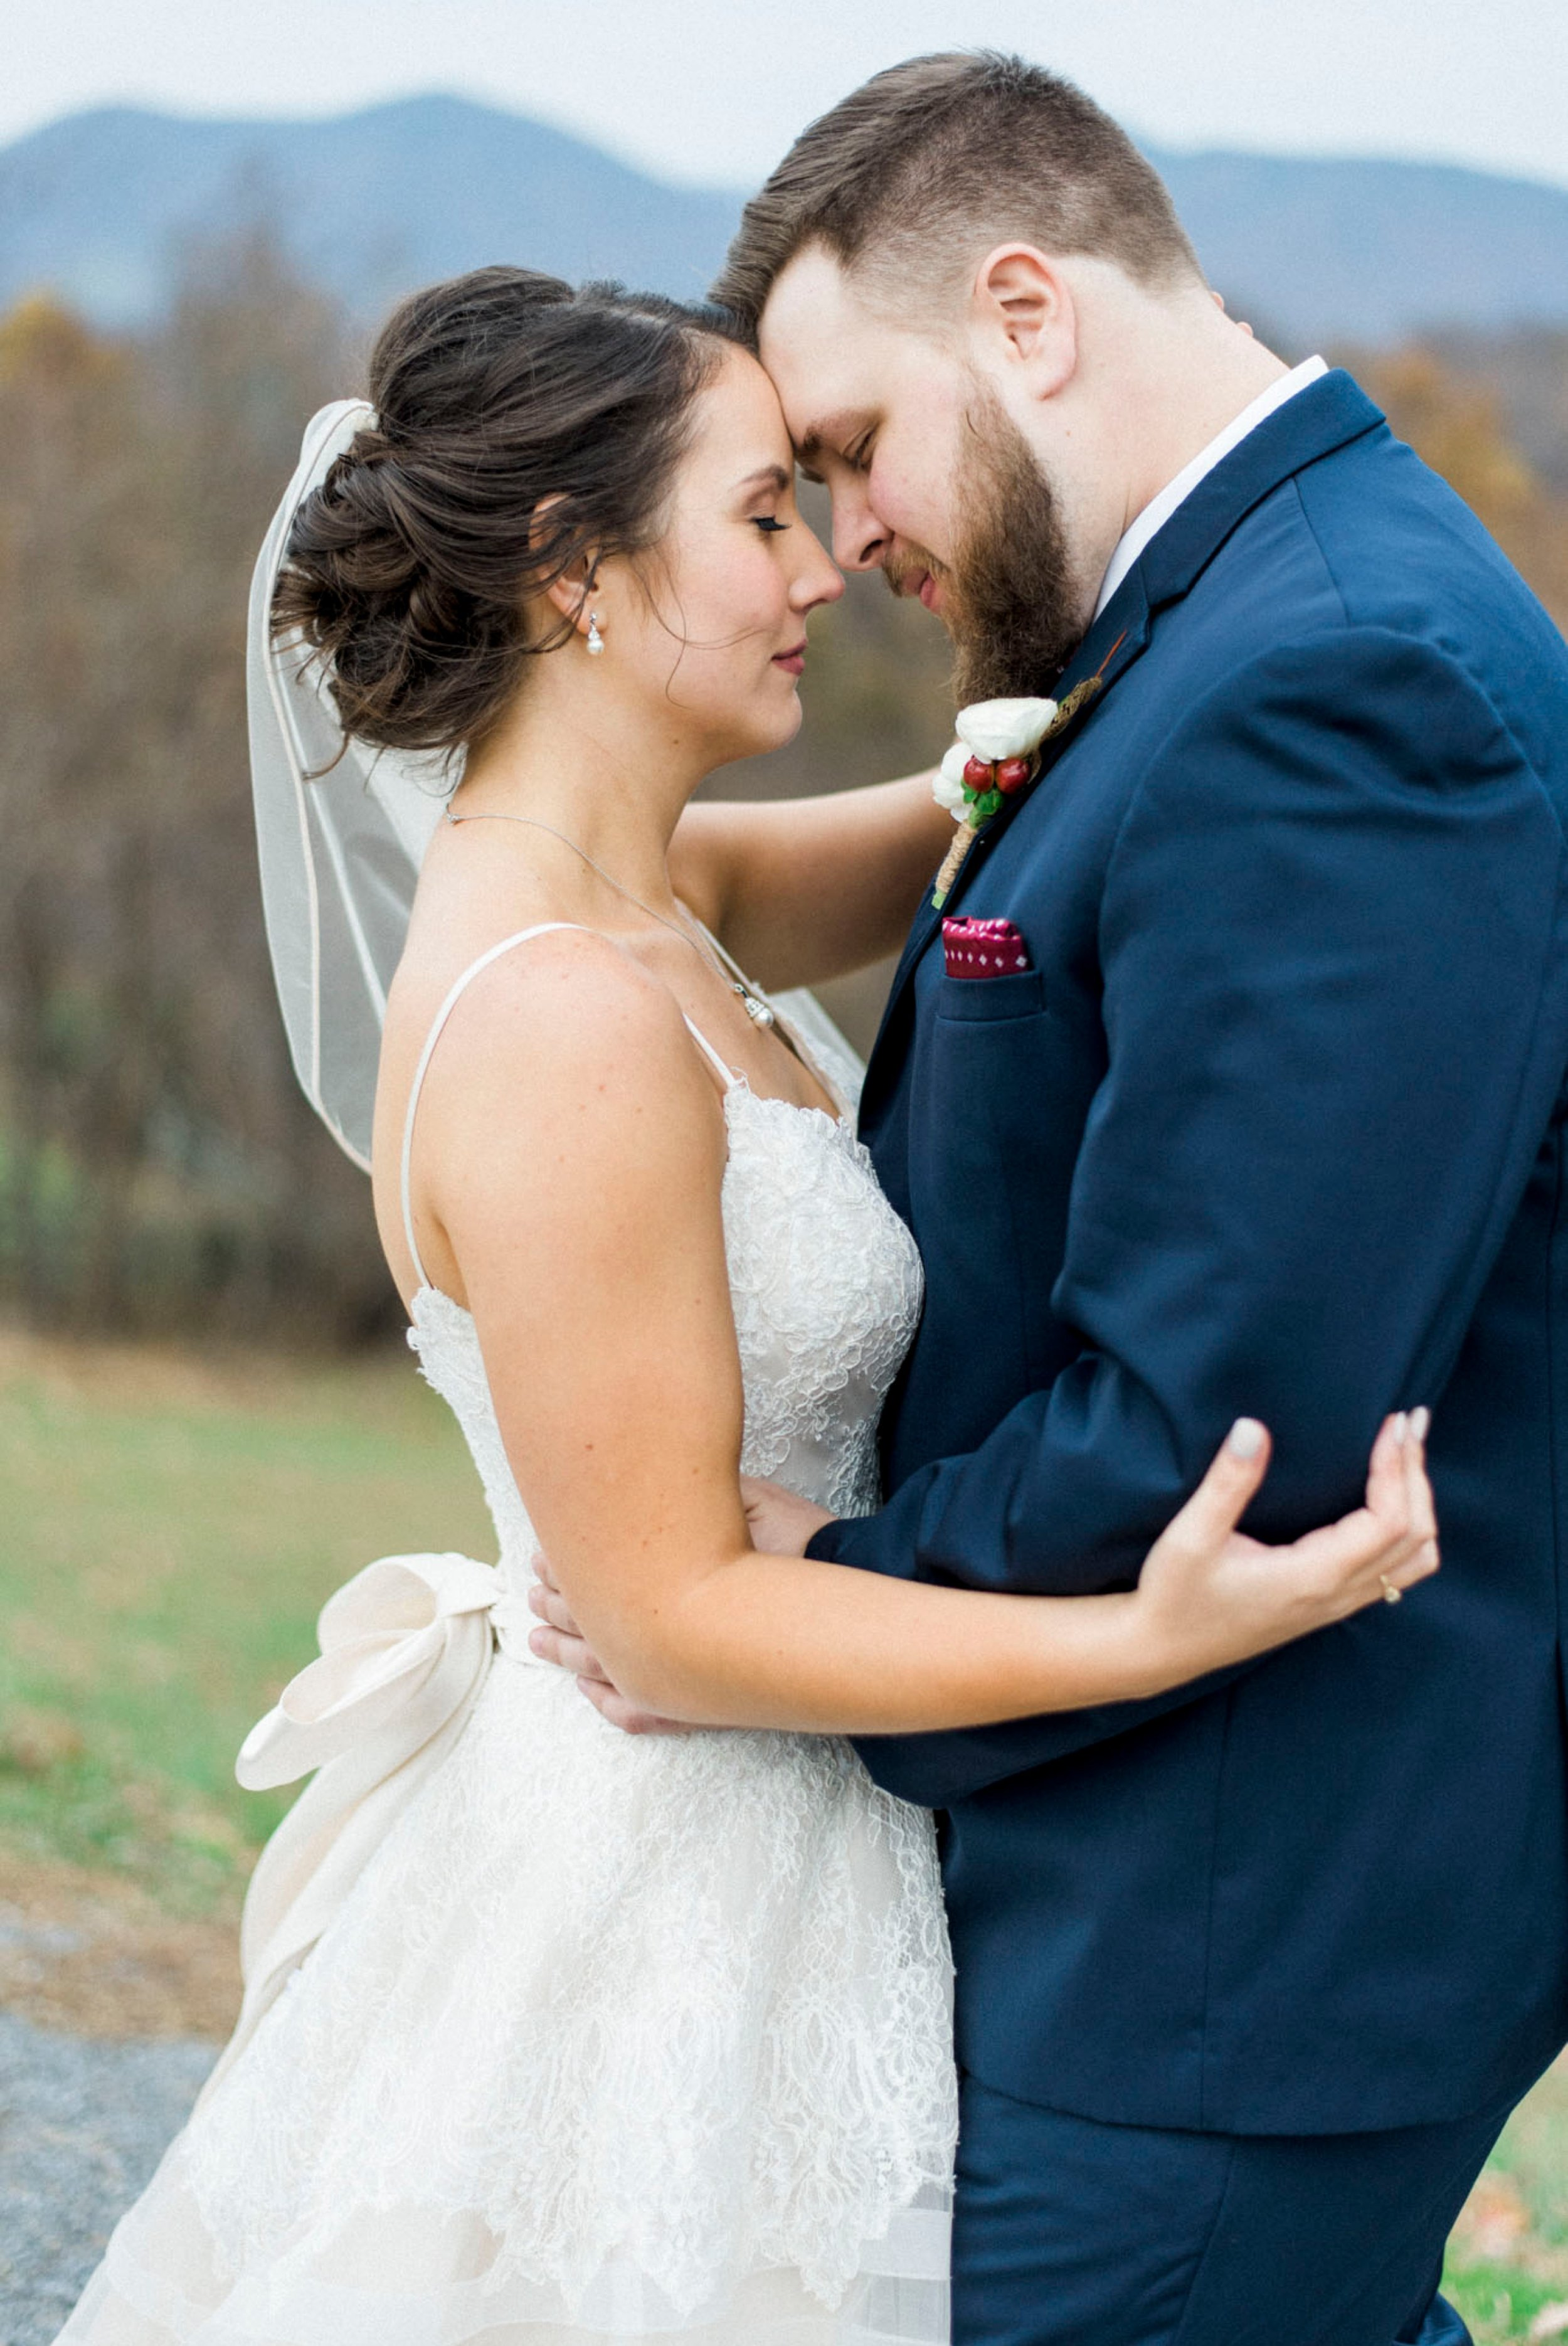 IrvineEstate_LexingtonVA_Wedding_FallWedding_VirginiaWeddingPhotographer 87.jpg